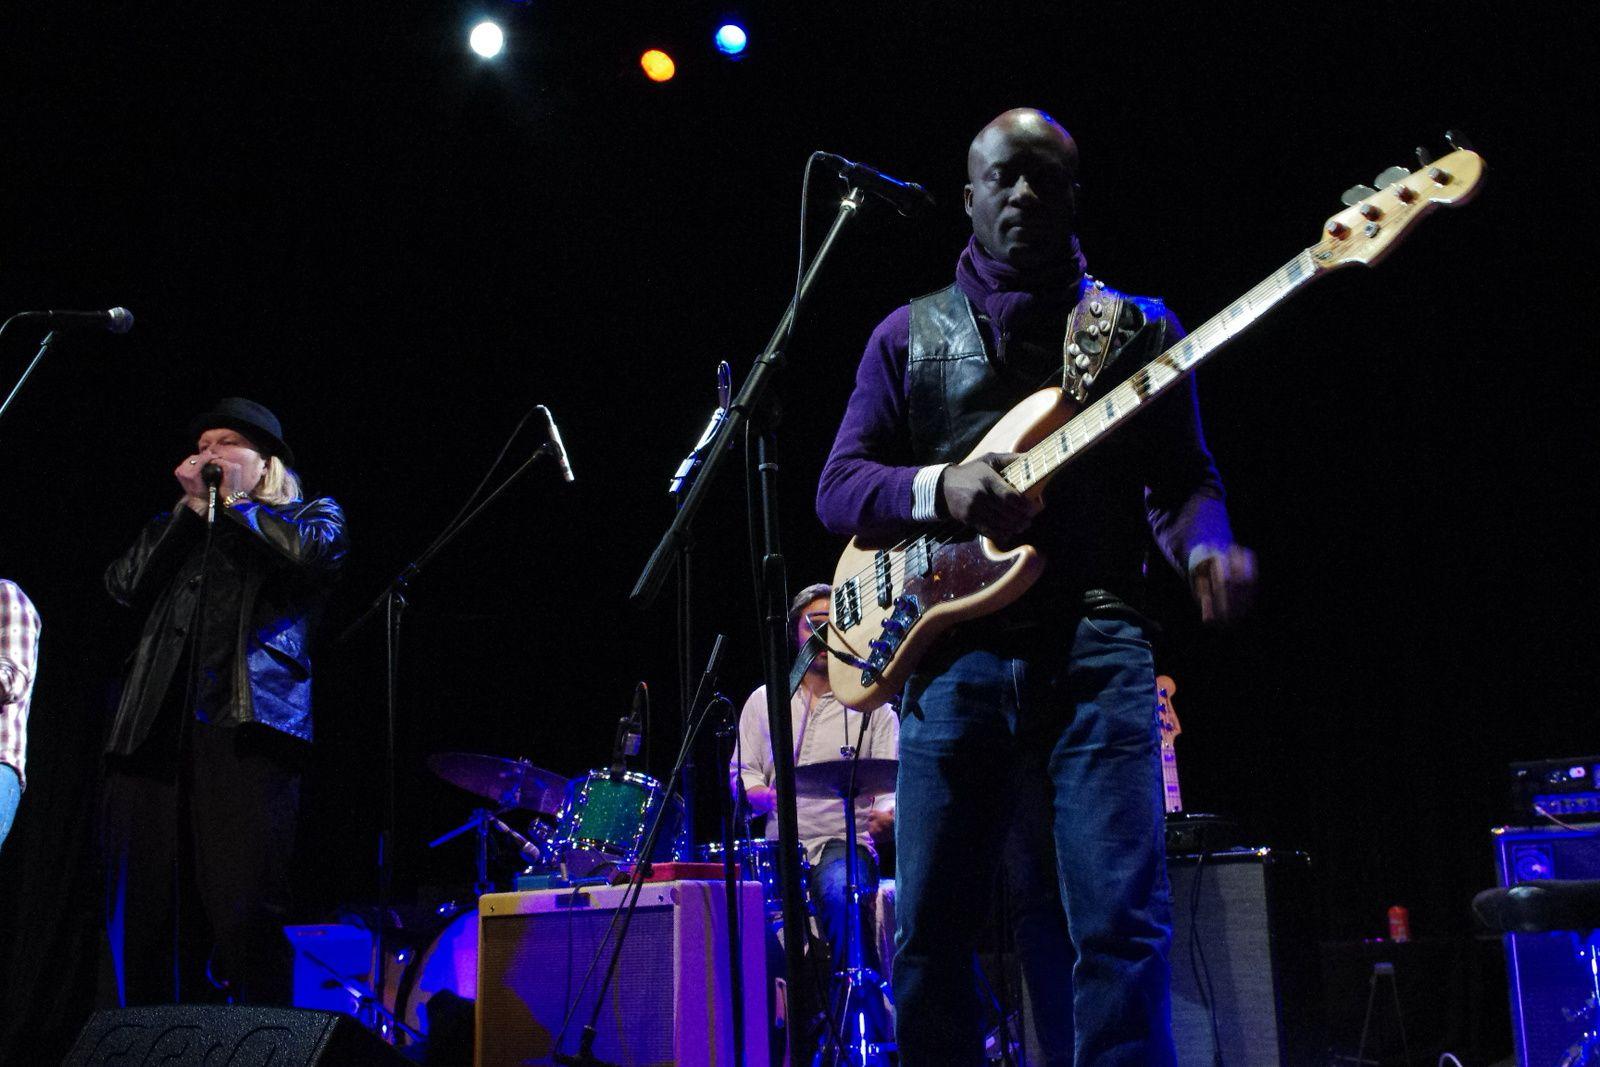 Big Pete's Band - 01 février 2014 - 7 nights to blues, St André lez Lille (59)